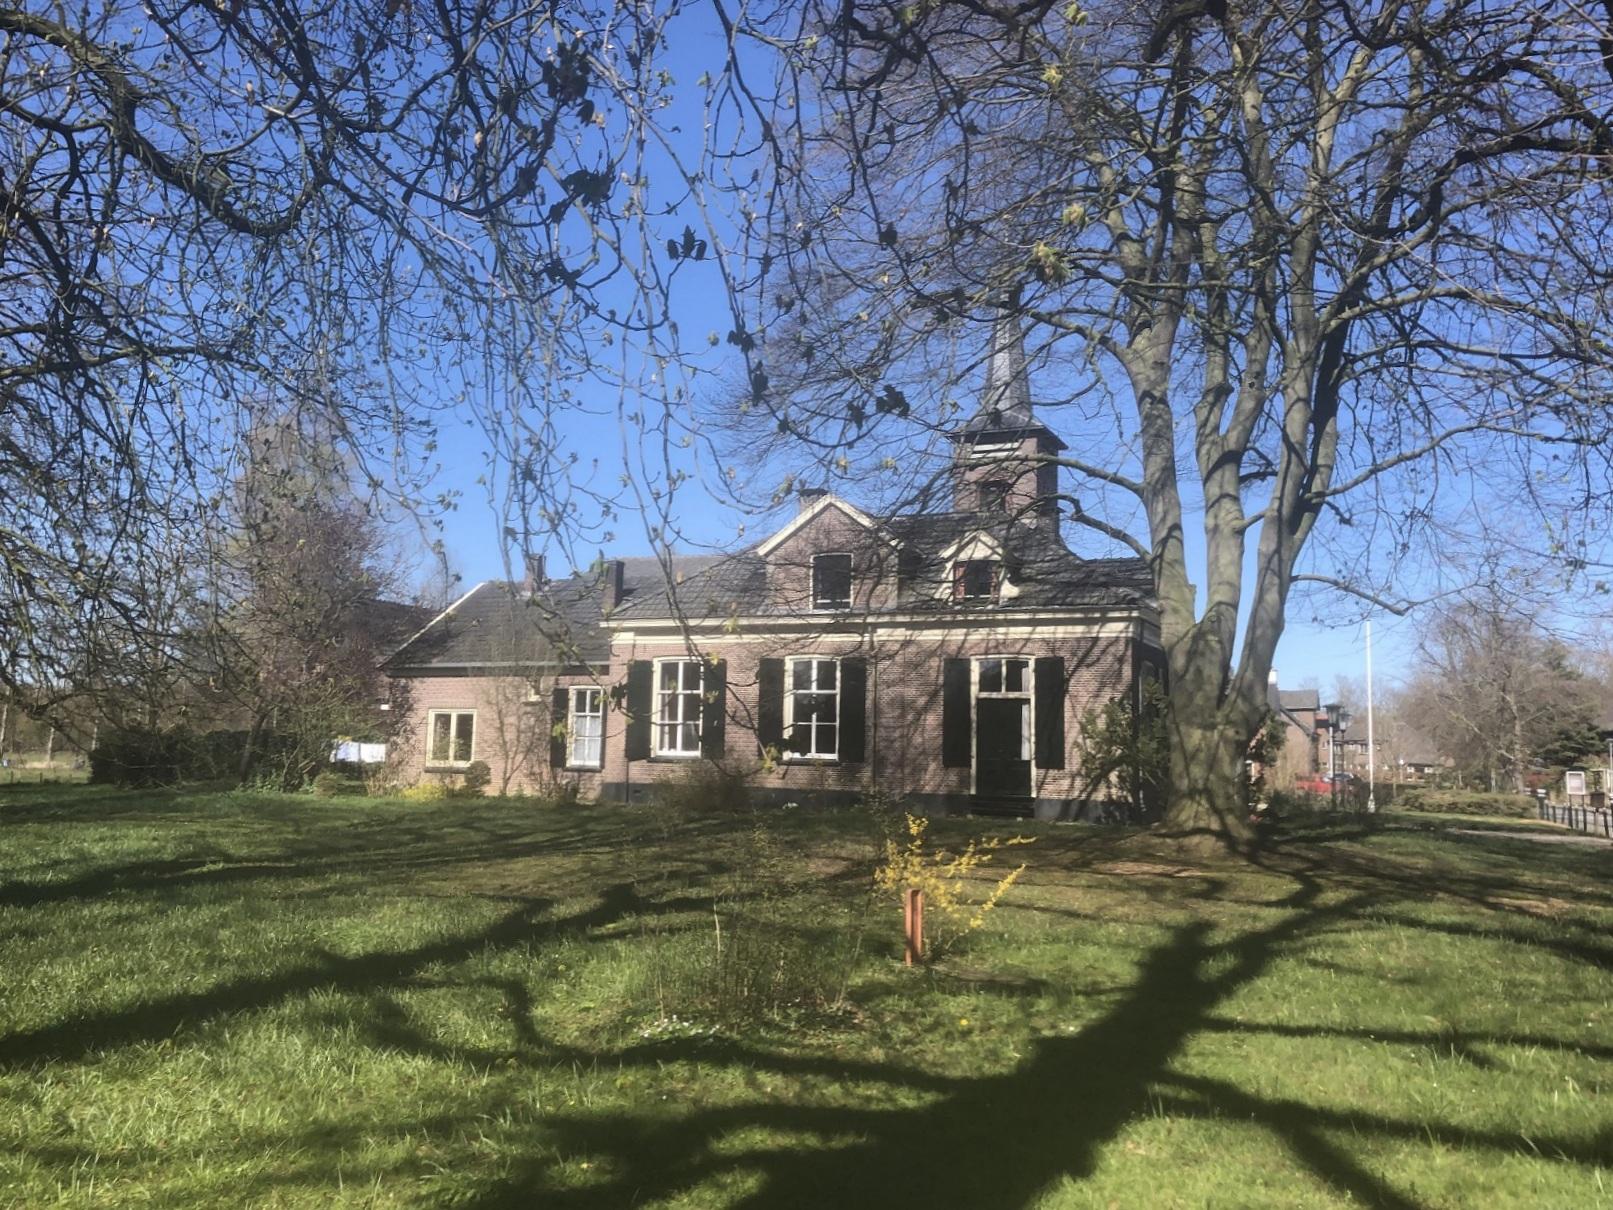 Wichmond Pastorie Kerk Woning